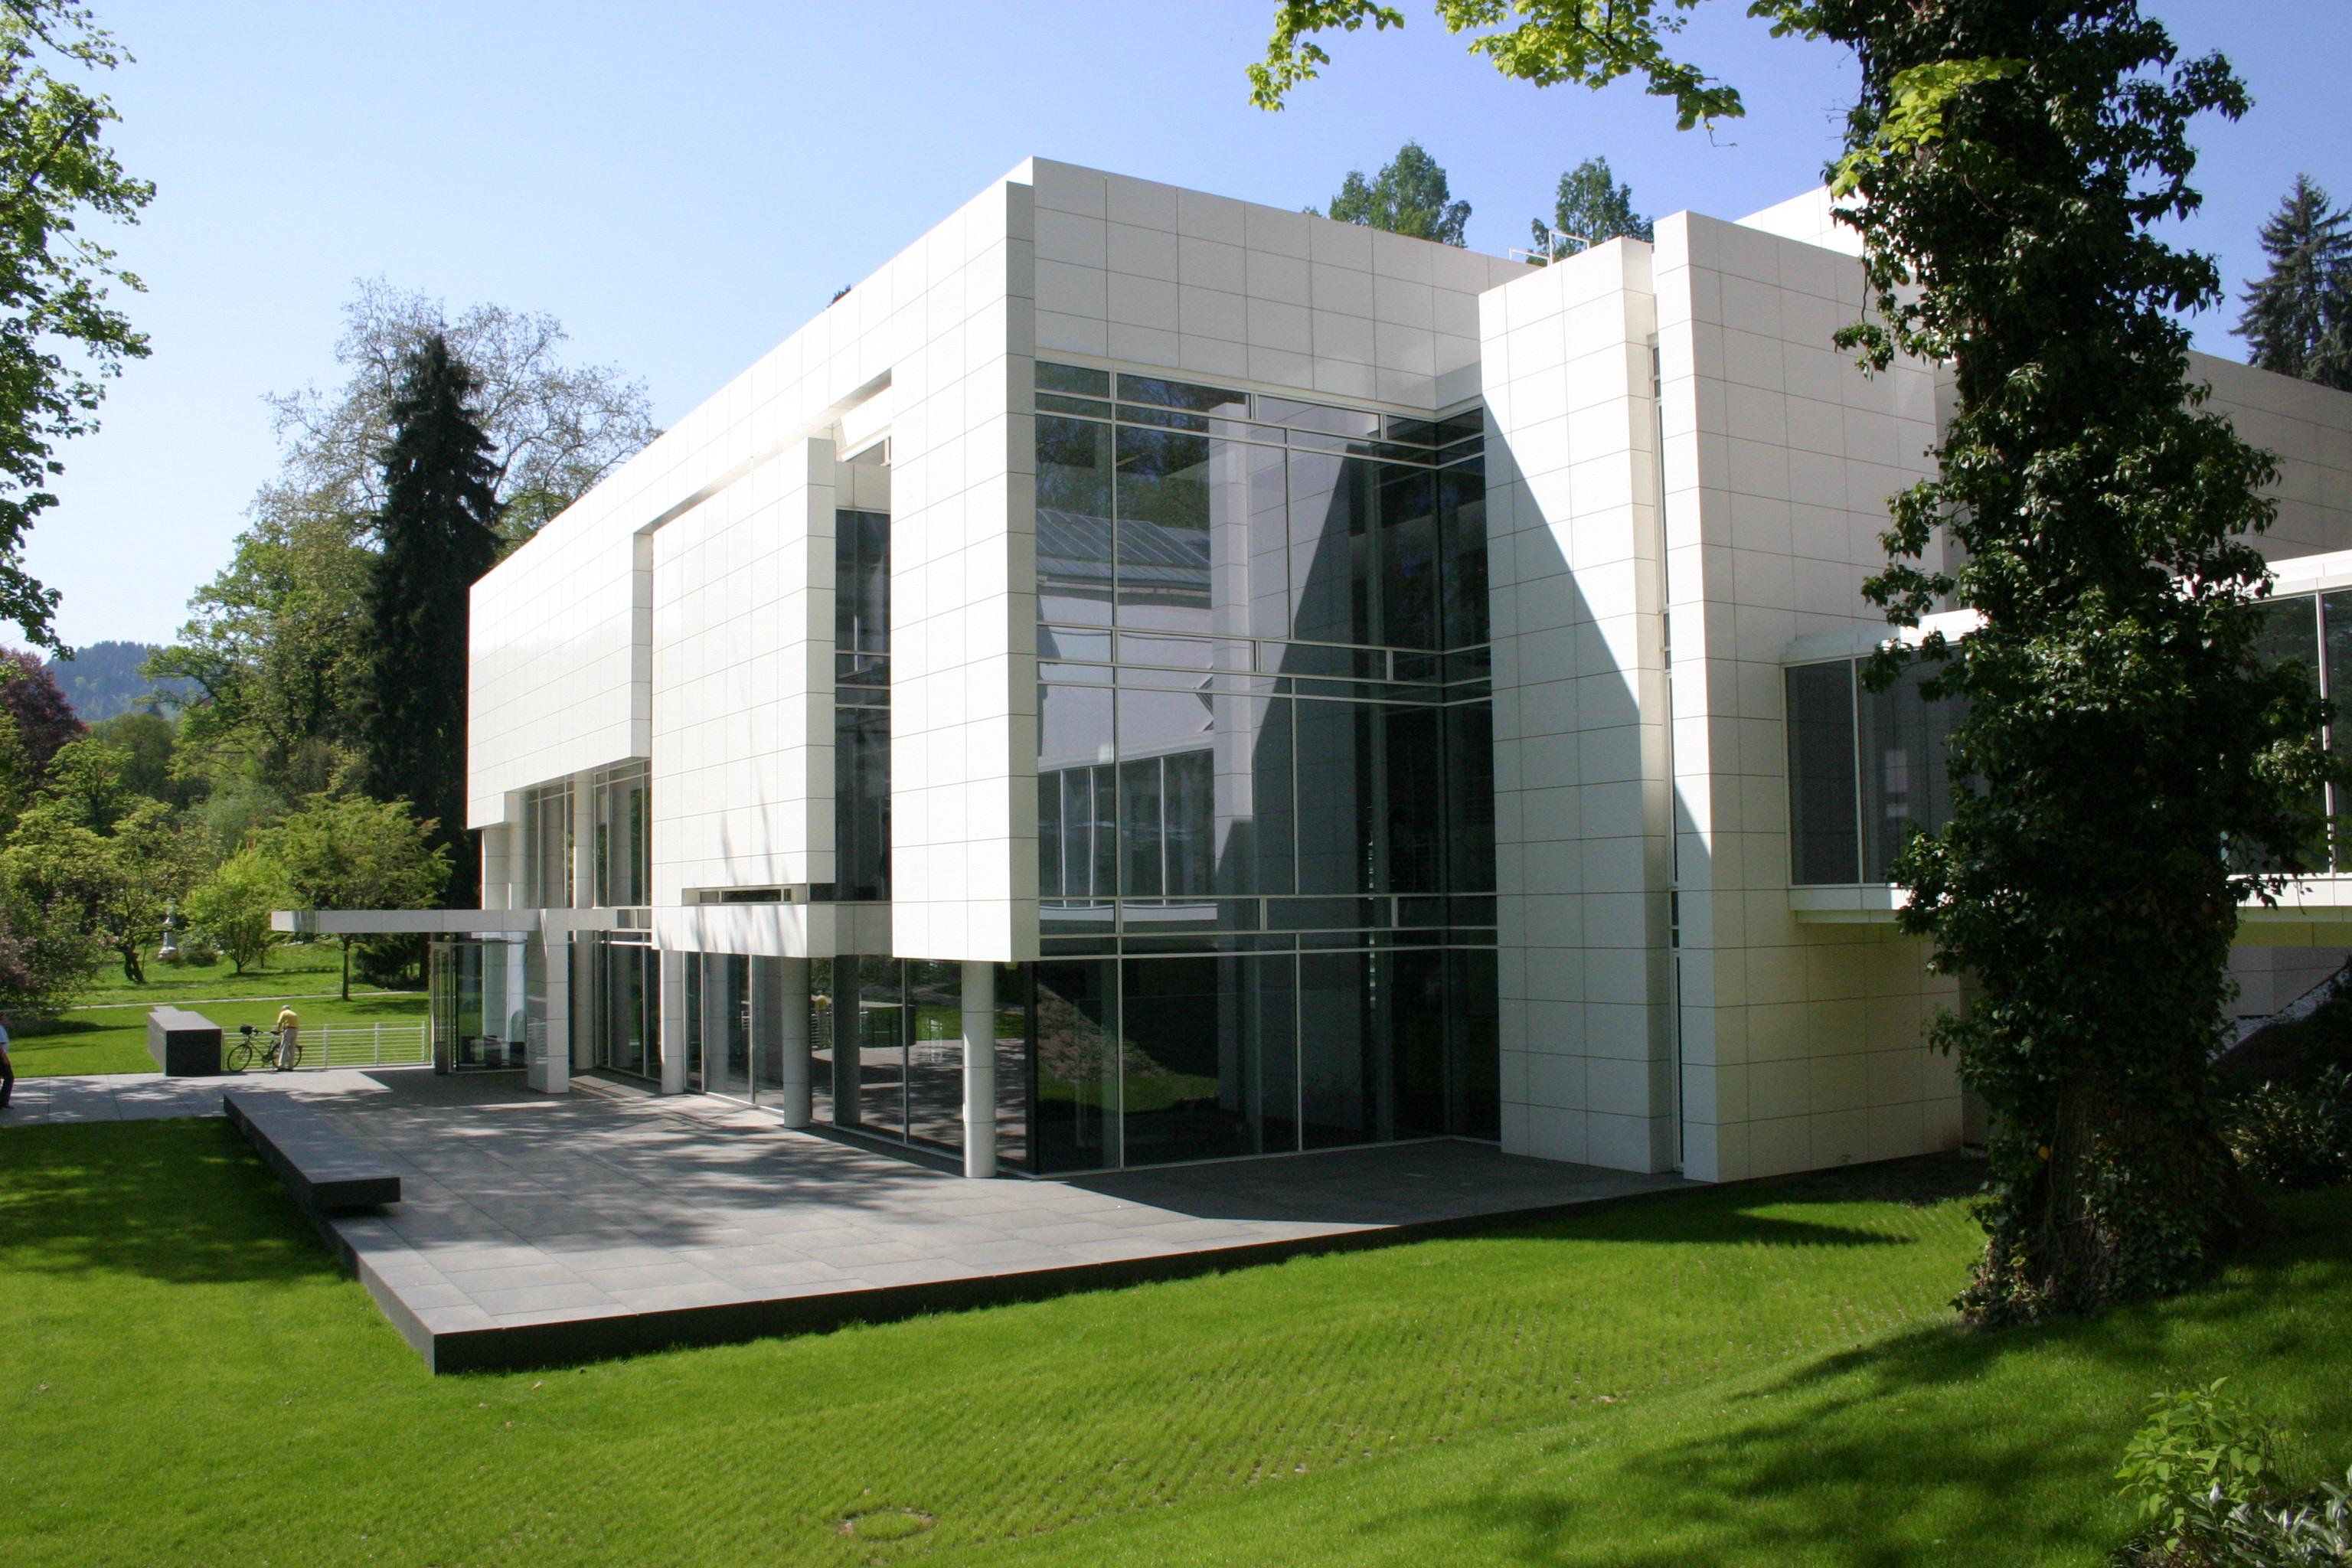 Baden-Baden-Frieder-Burda-Museum-14-gje.jpg